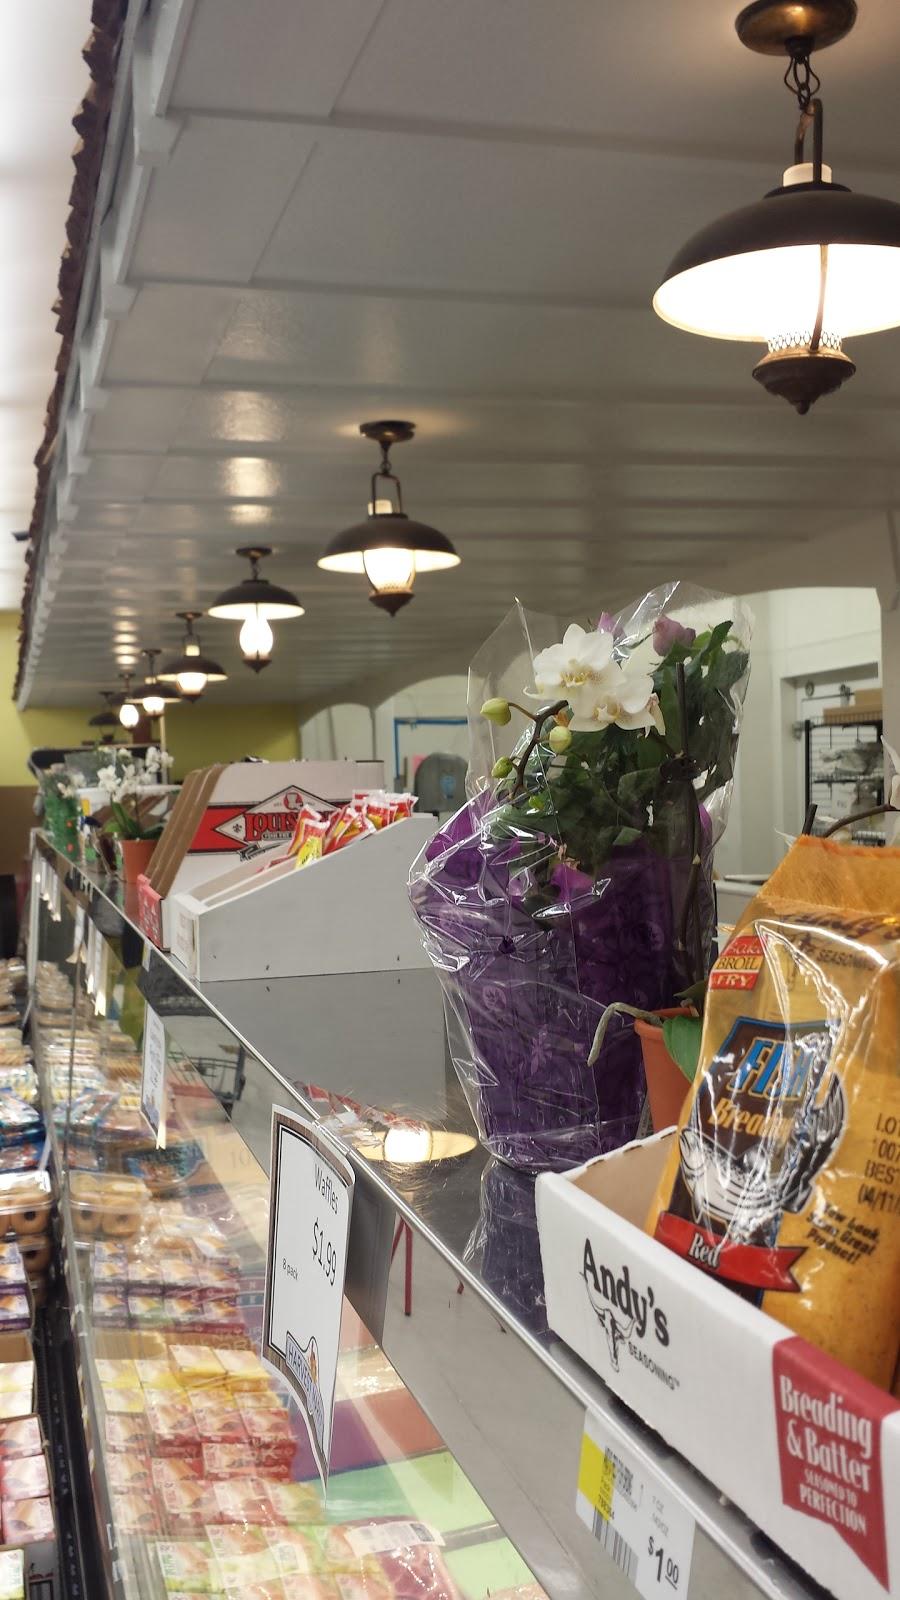 Harvest Supermarket - Frankton, Indiana - store    Photo 8 of 10   Address: 1108 IN-128, Frankton, IN 46044, USA   Phone: (765) 754-1000